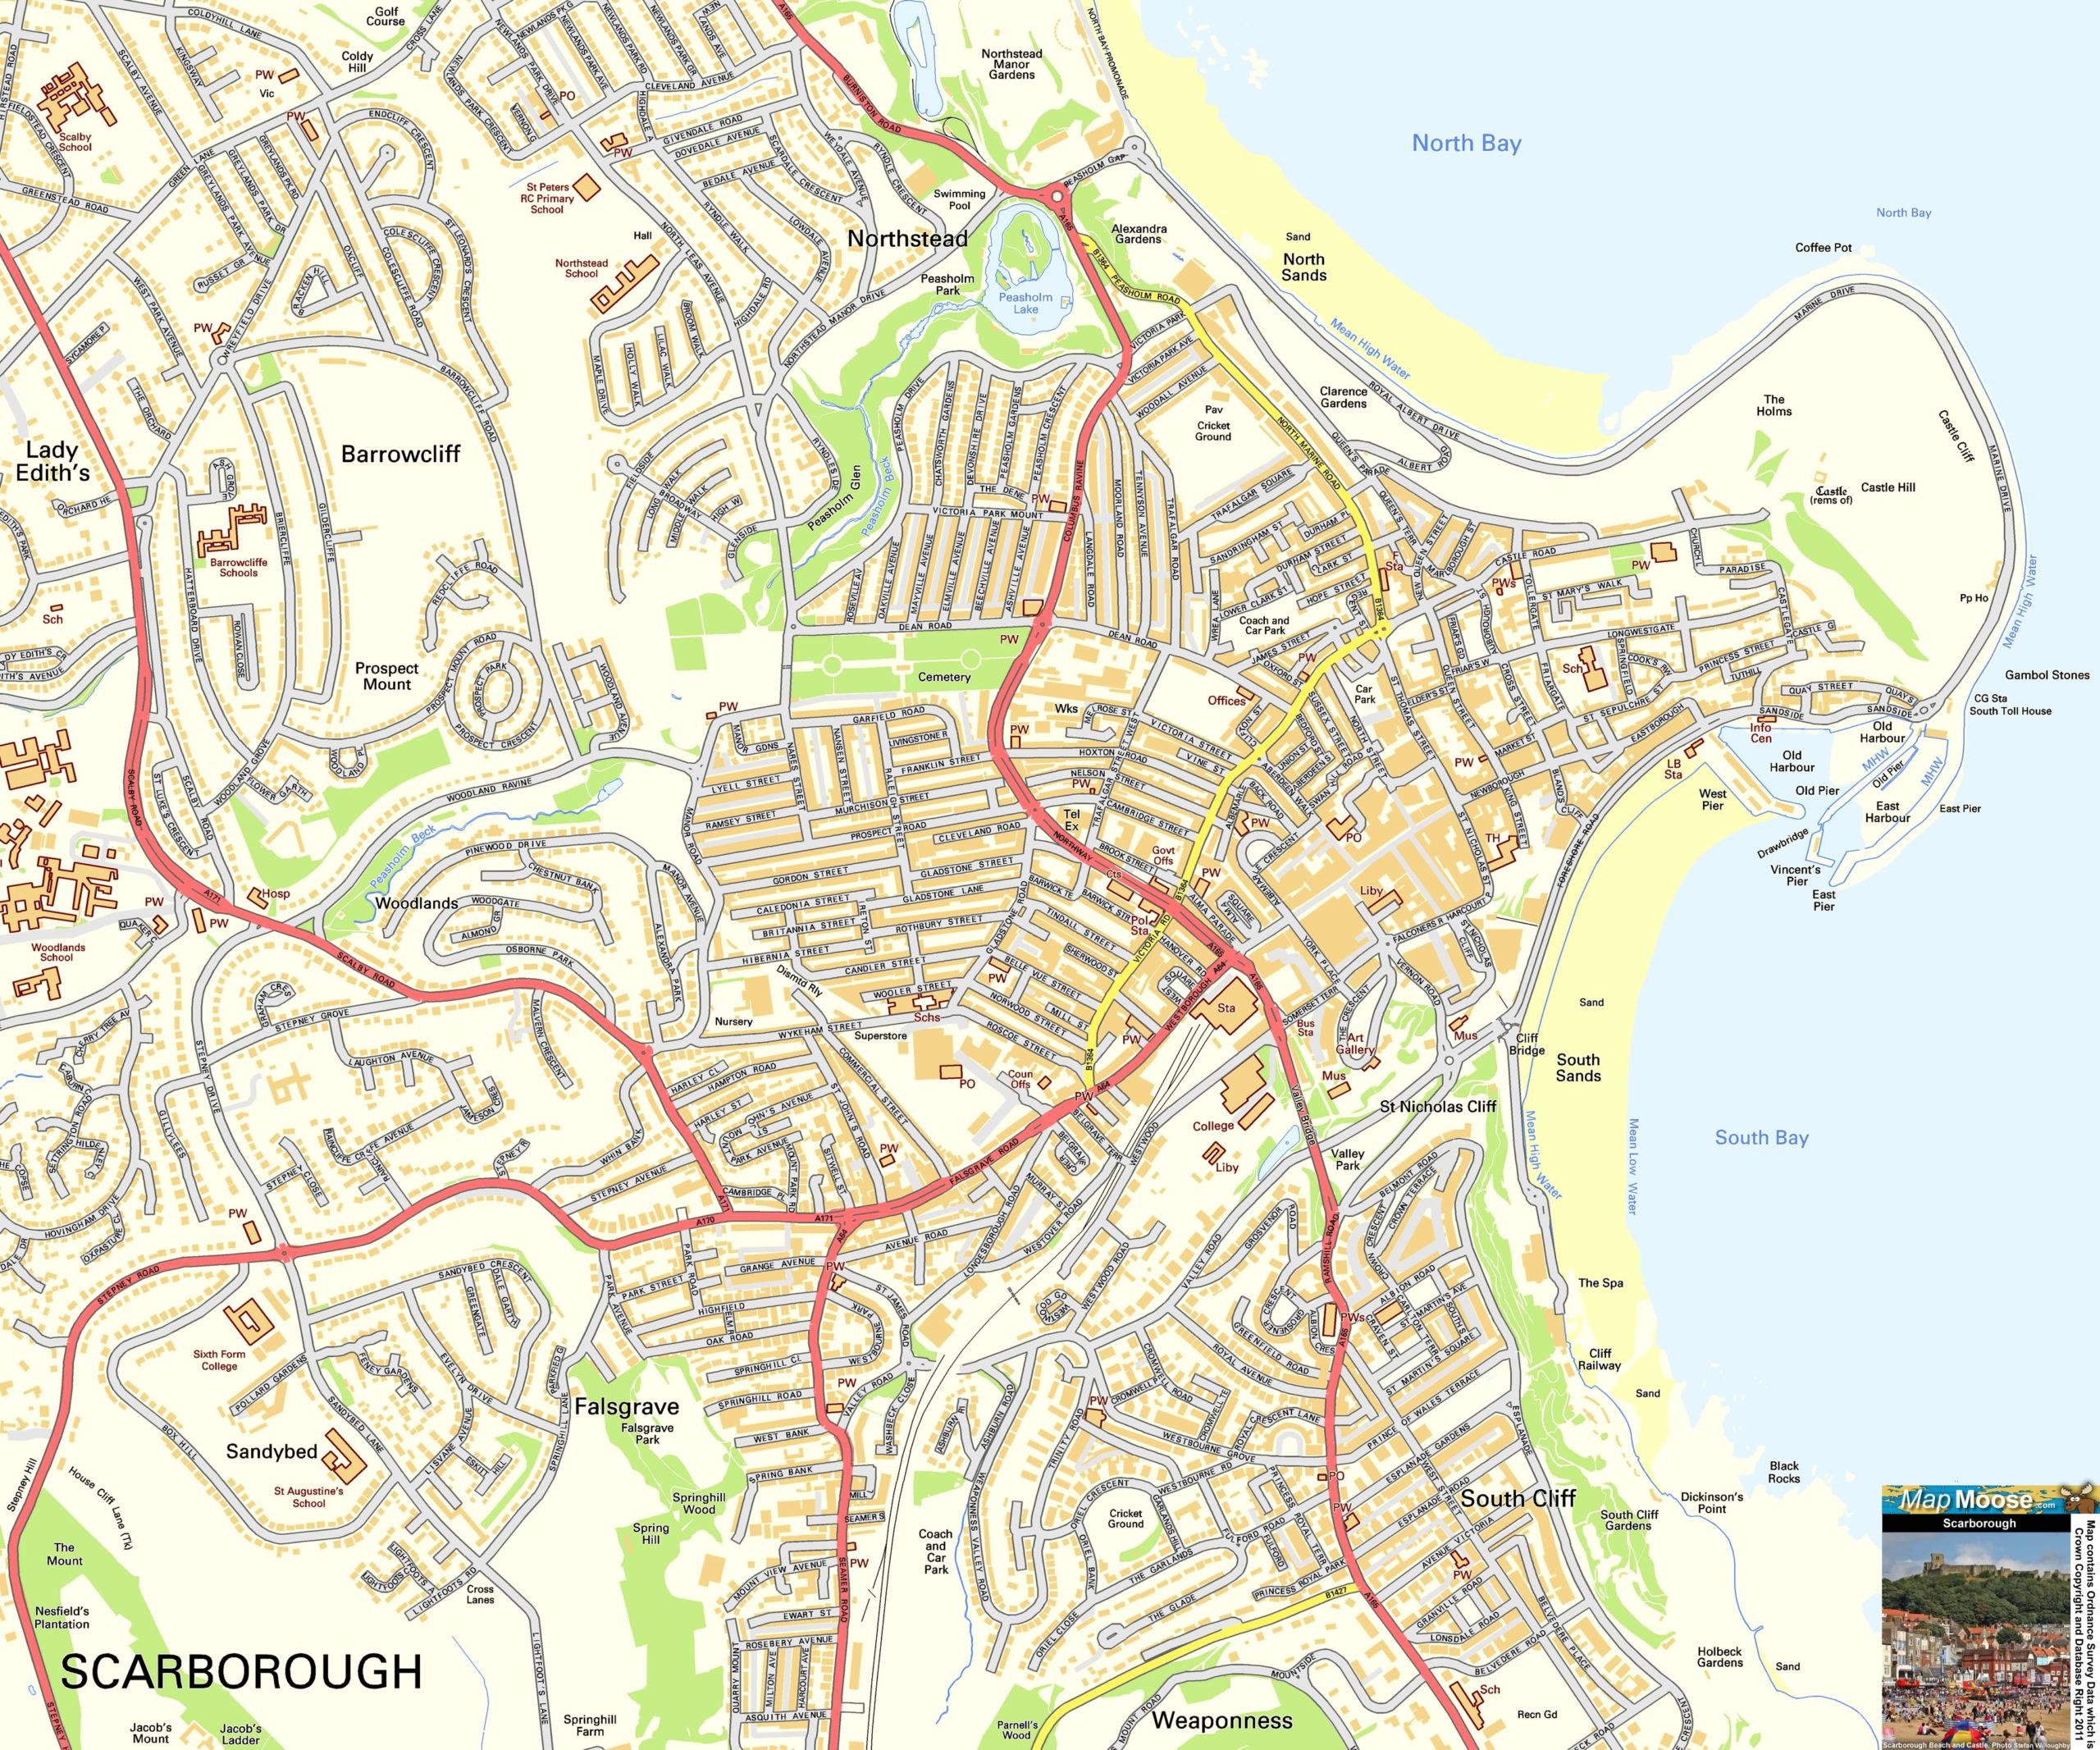 Scarborough Offline Street Map Including Scarborough